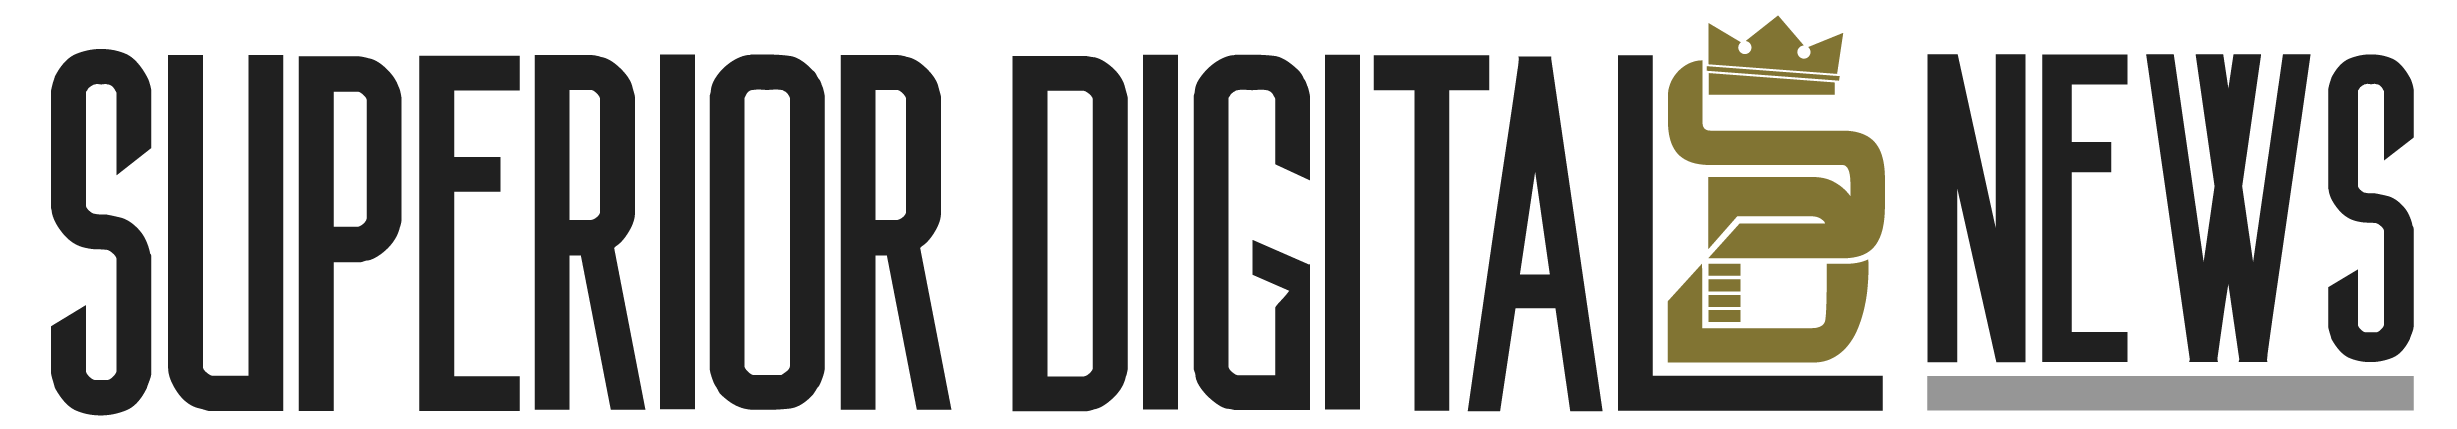 Superior Digital News Logo (Black and Gold)